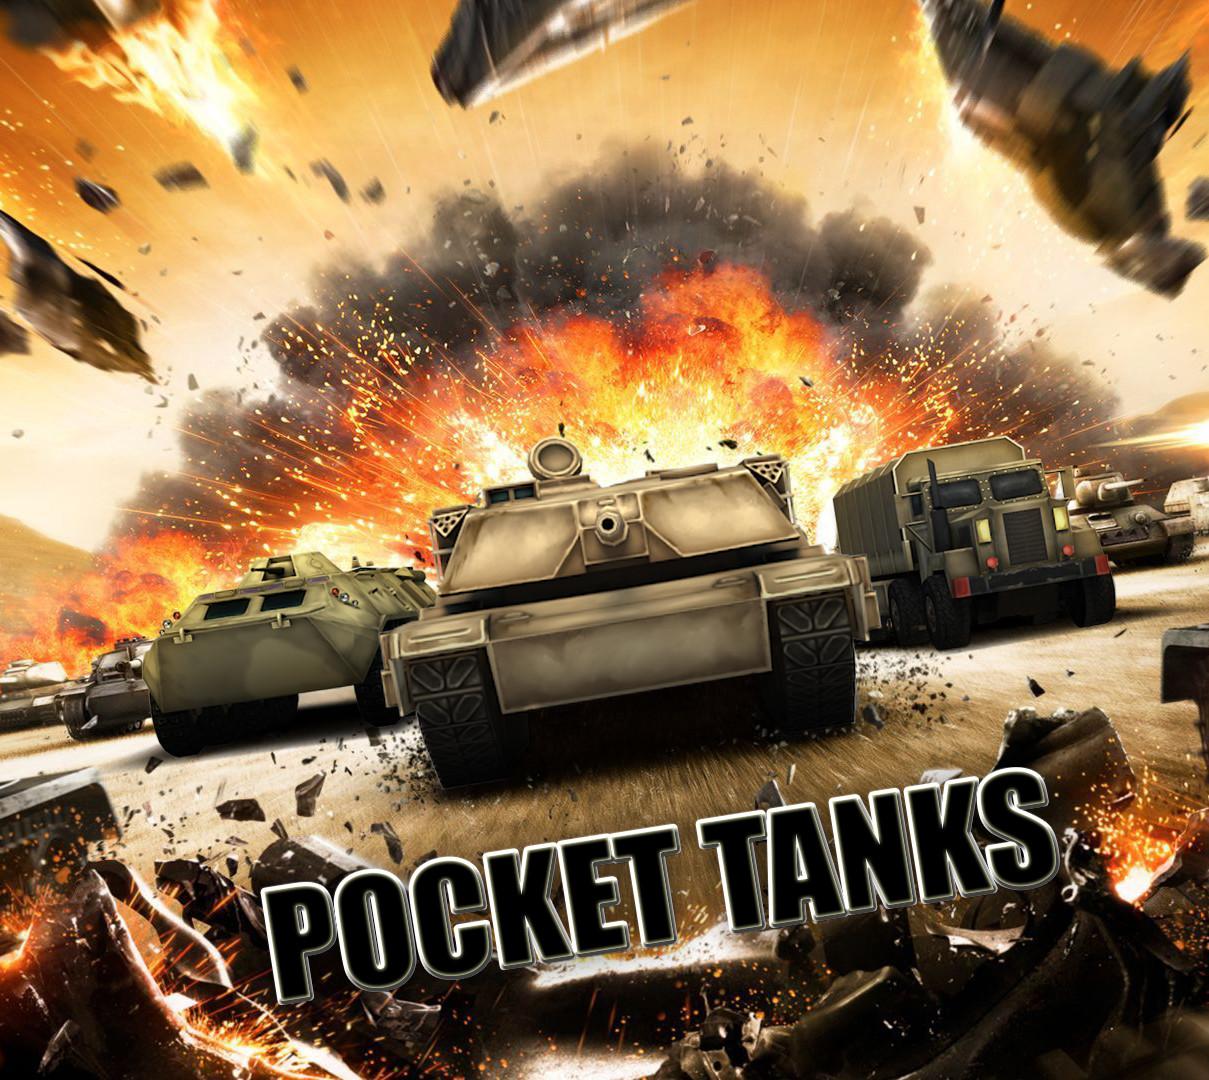 ArtStation - Pocket Tanks - unity tank project, Constantine